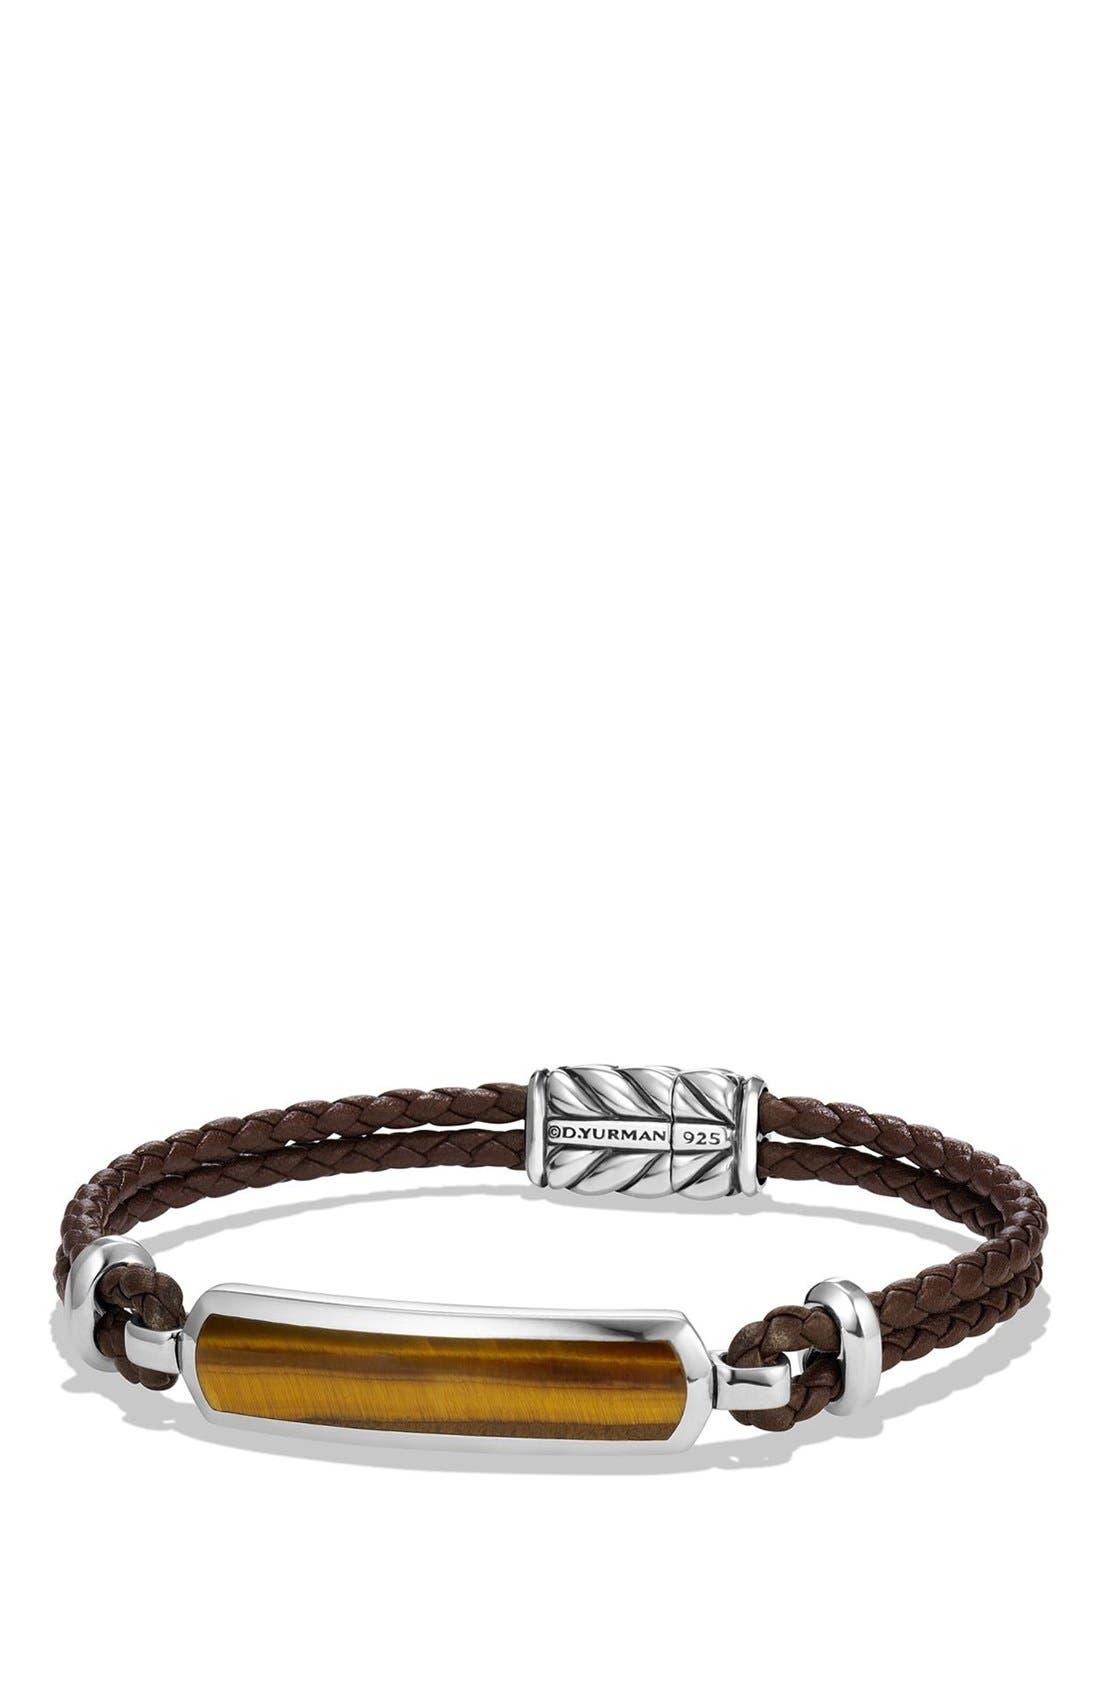 Alternate Image 1 Selected - David Yurman Bar Station Leather Bracelet